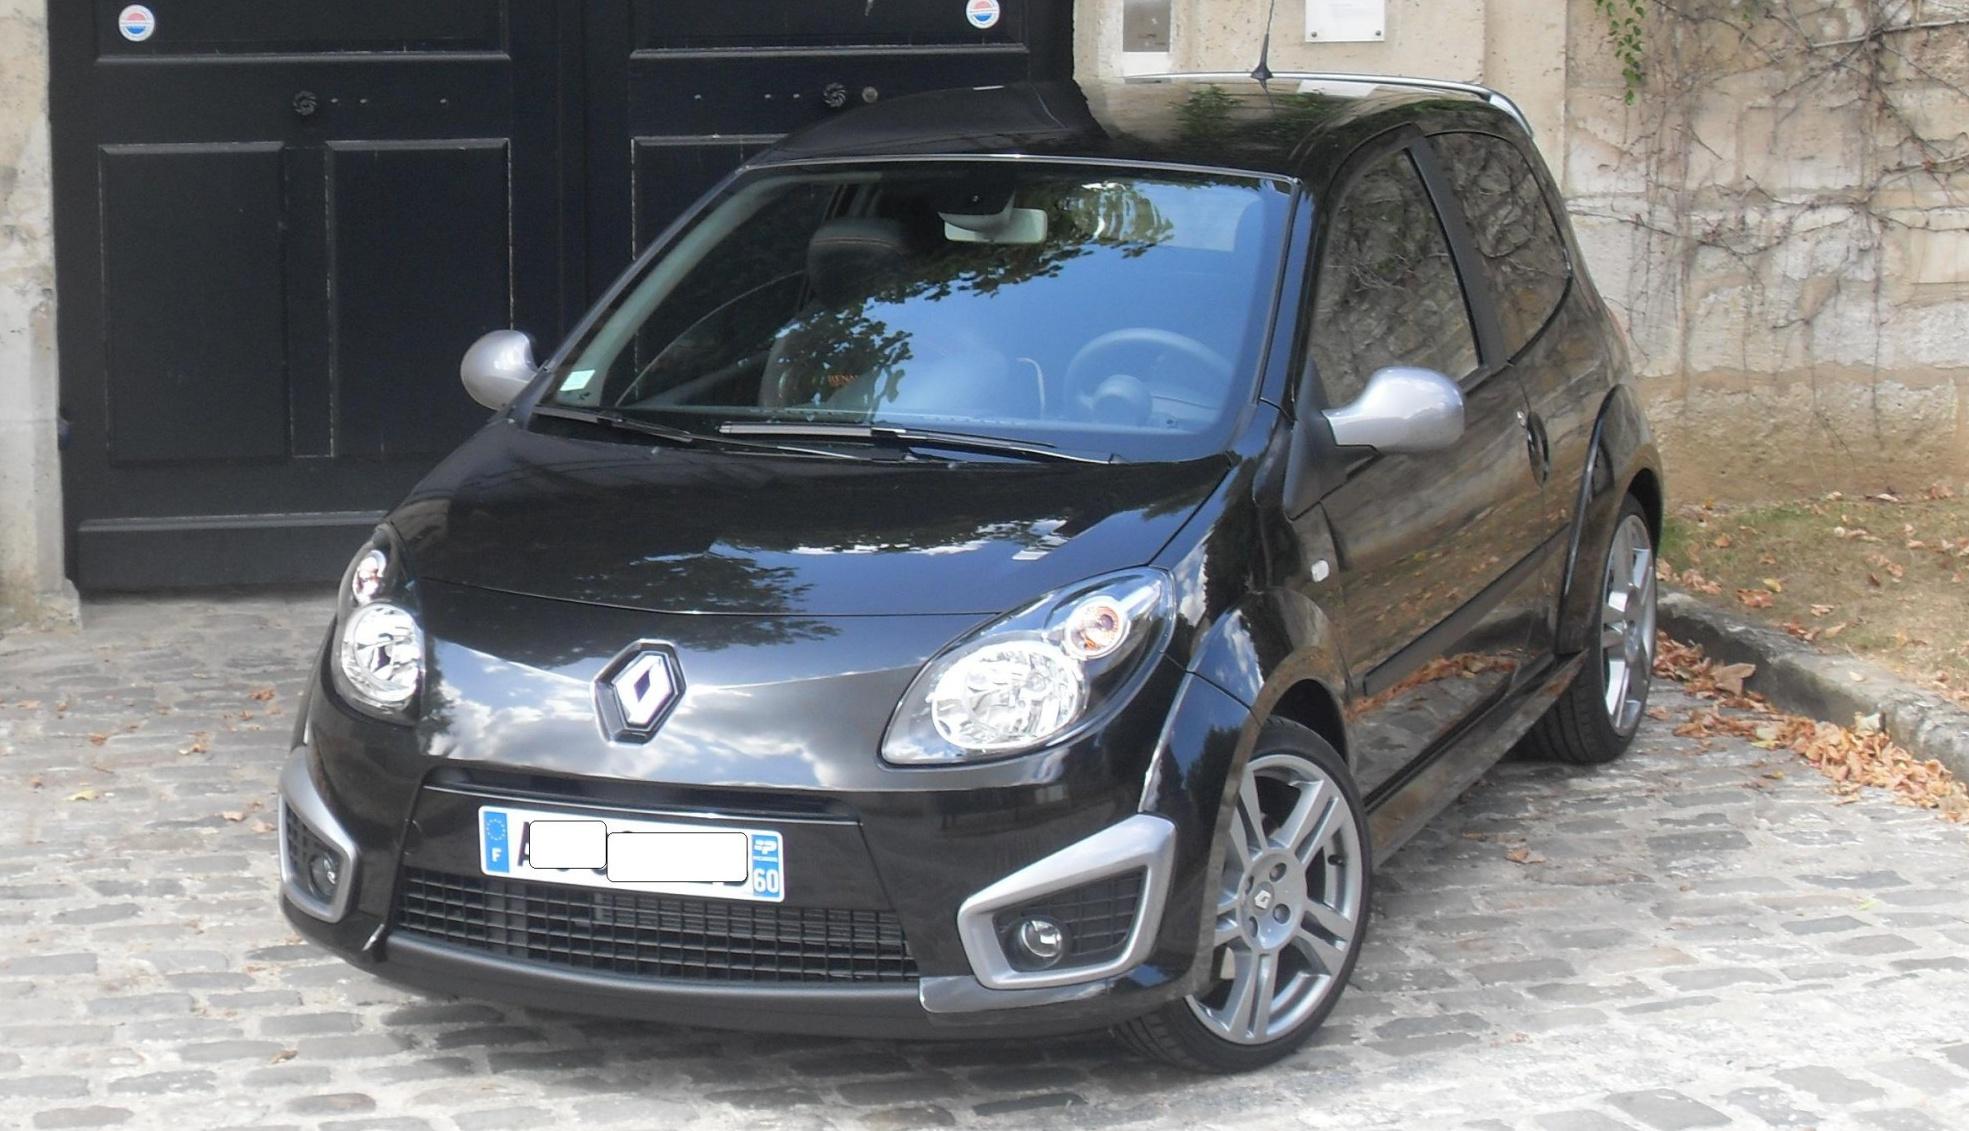 Forum Renault Twingo - Auto titre